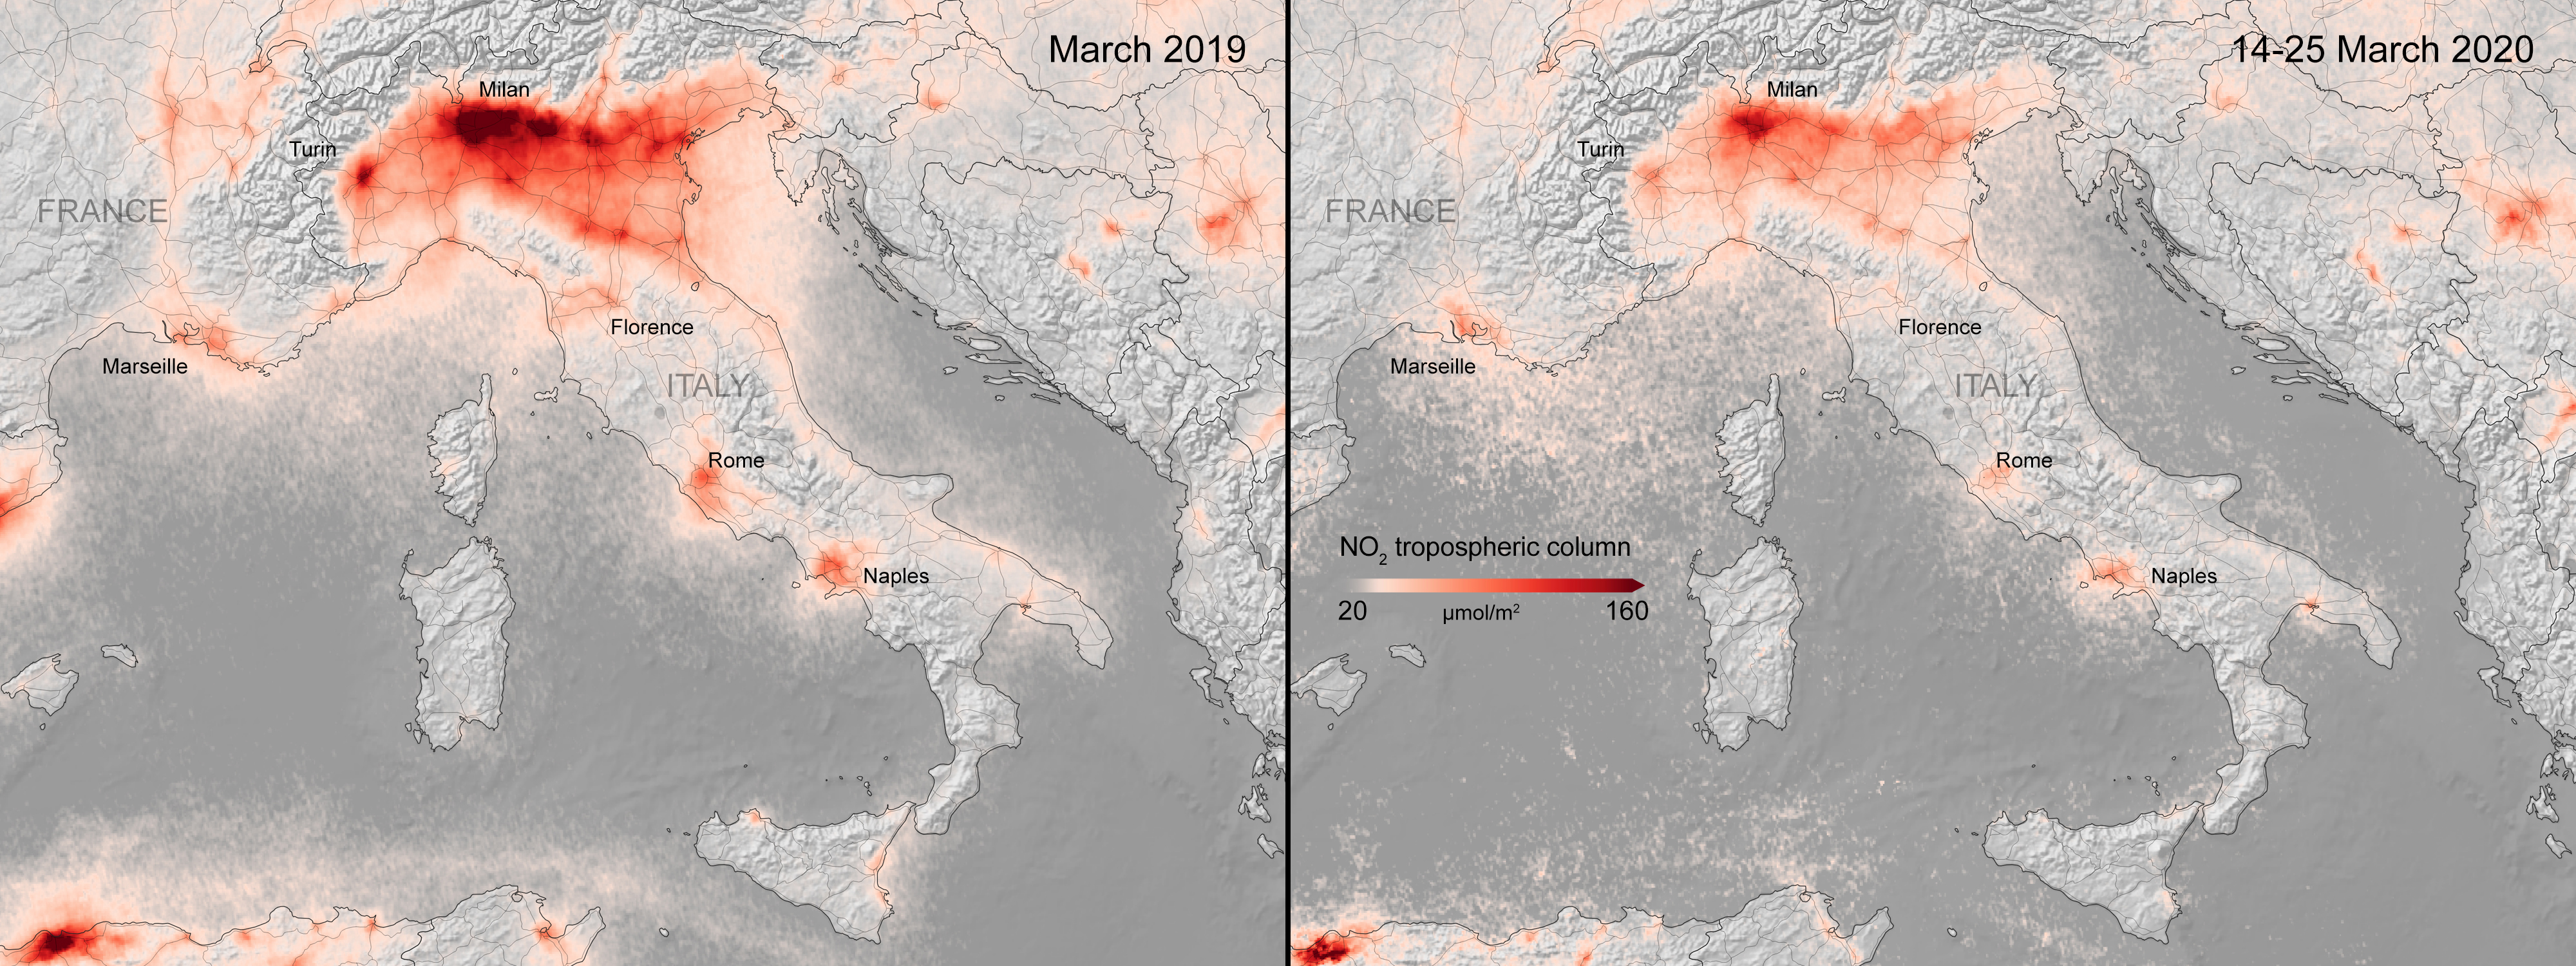 mappa inquinamento coronavirus